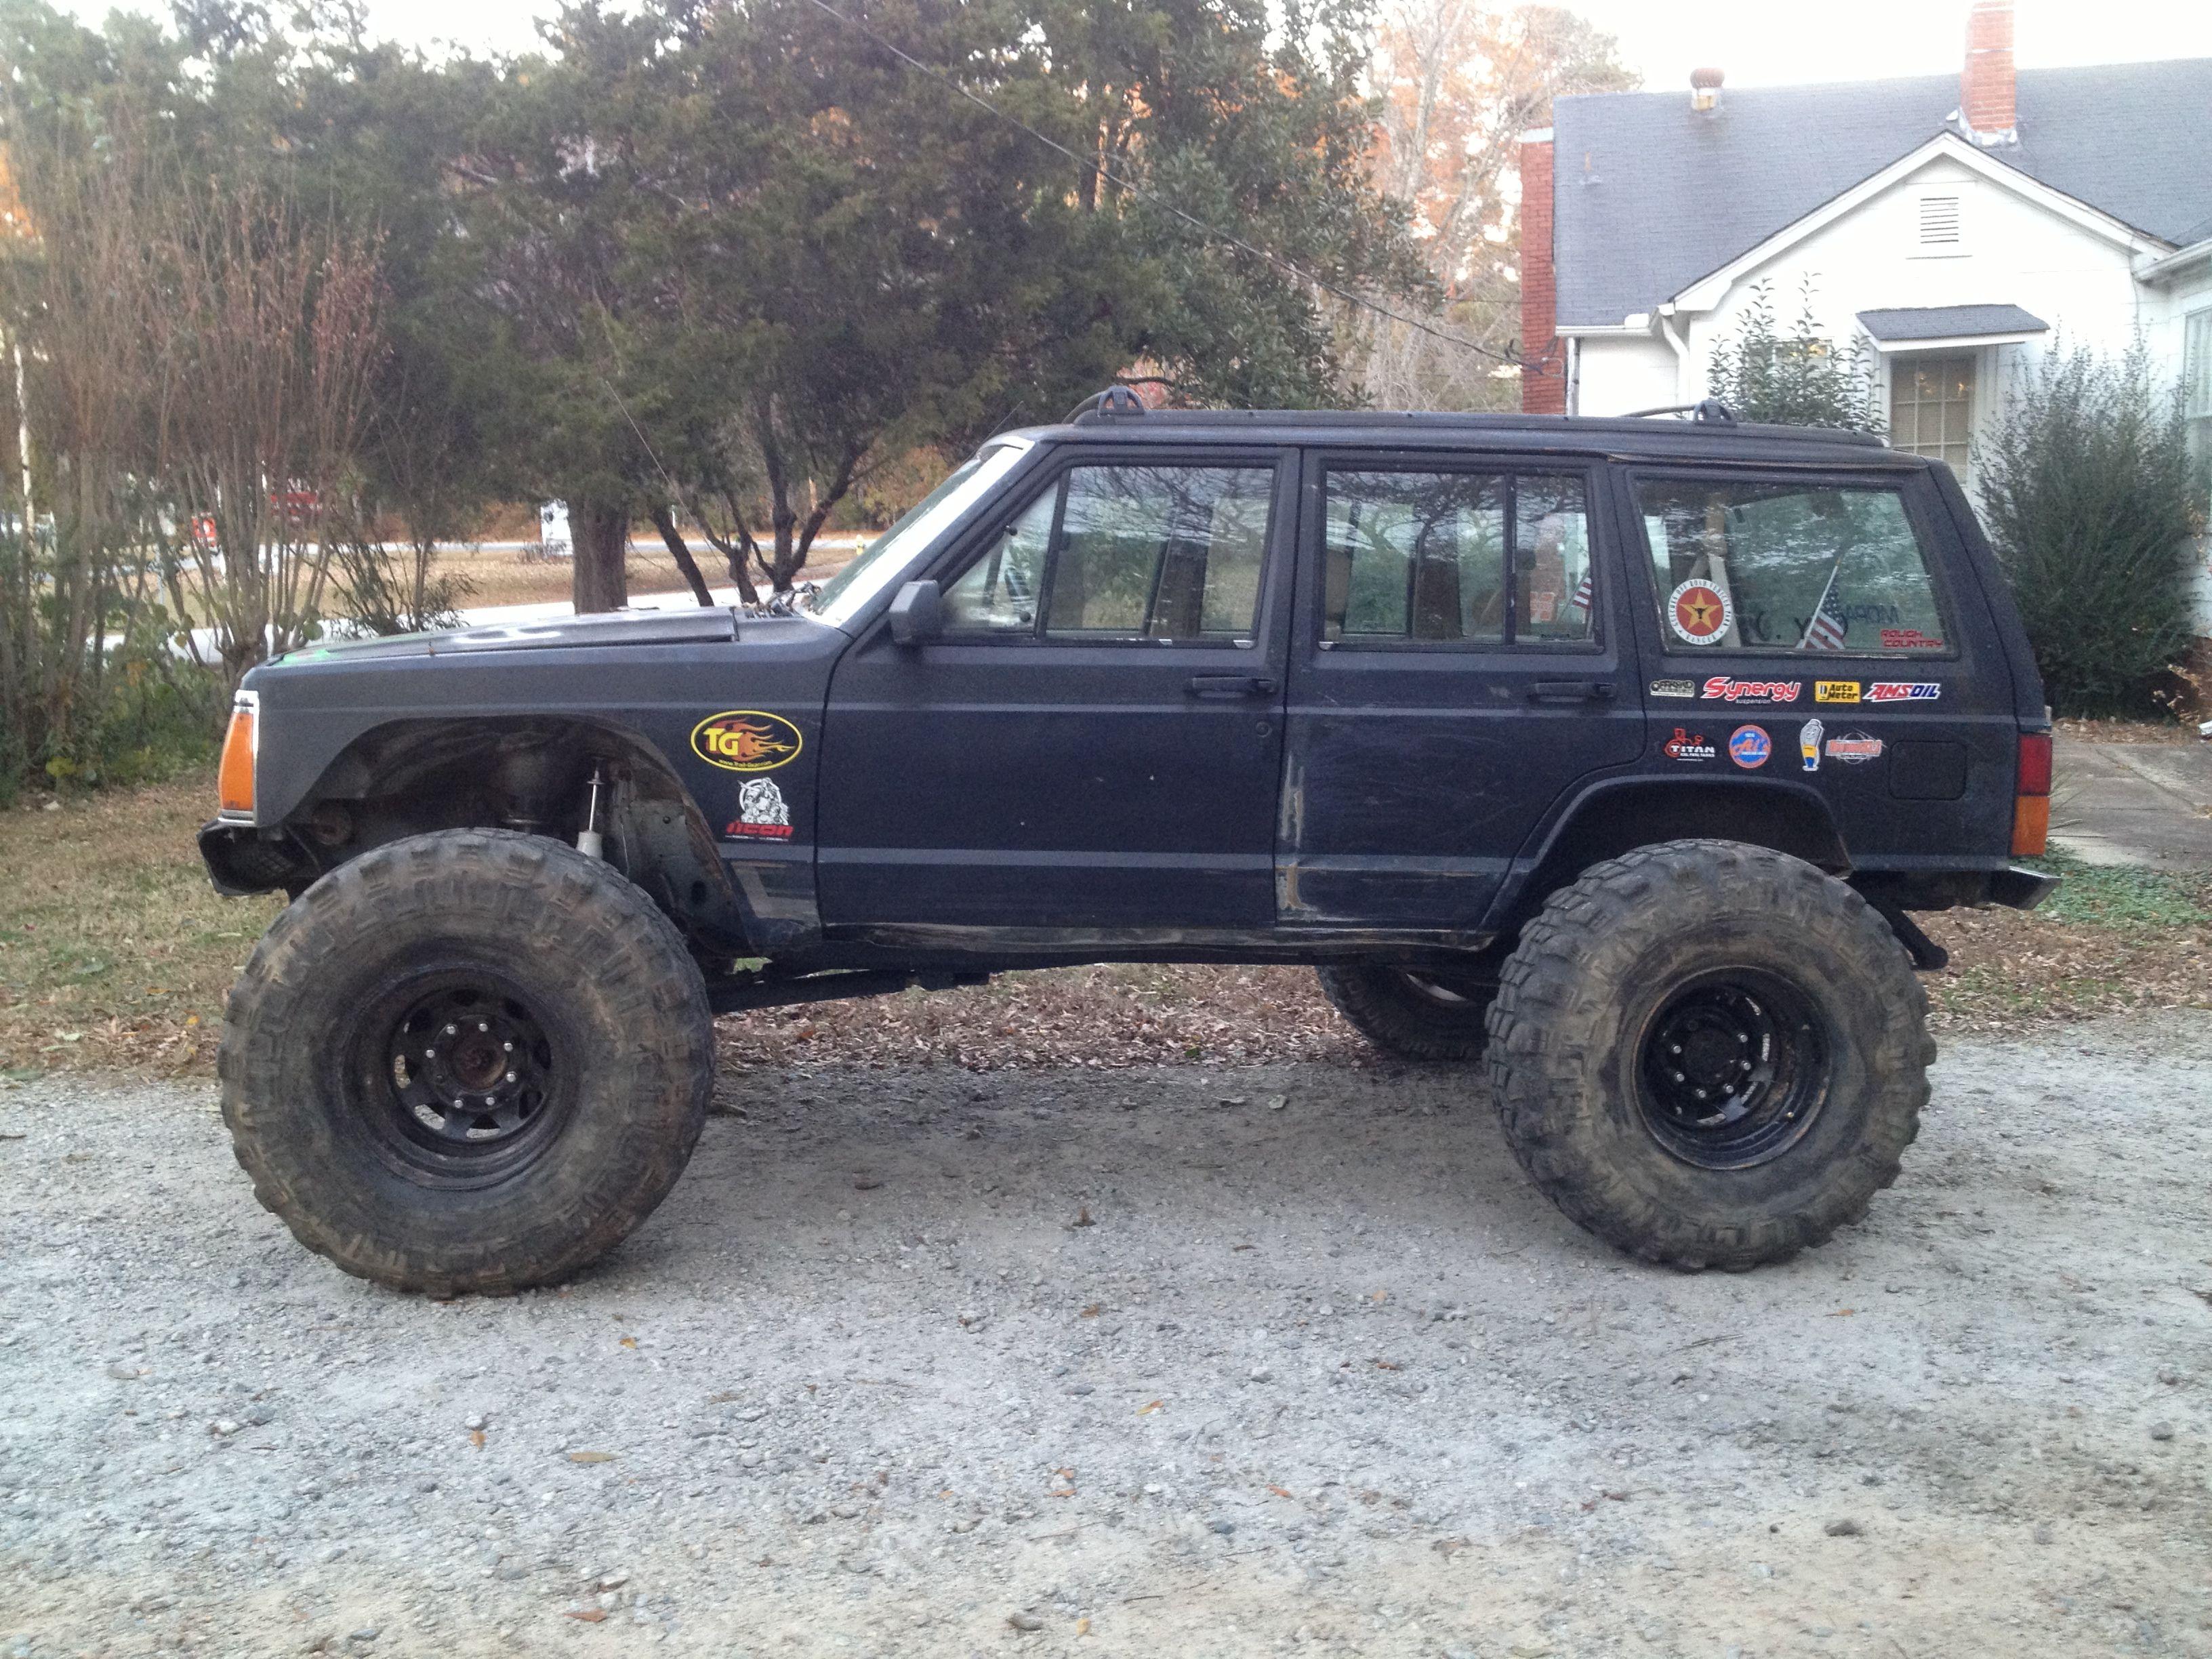 My Rock Crawler Xj Jeep Xj Jeep Cherokee Xj Lifted Jeep